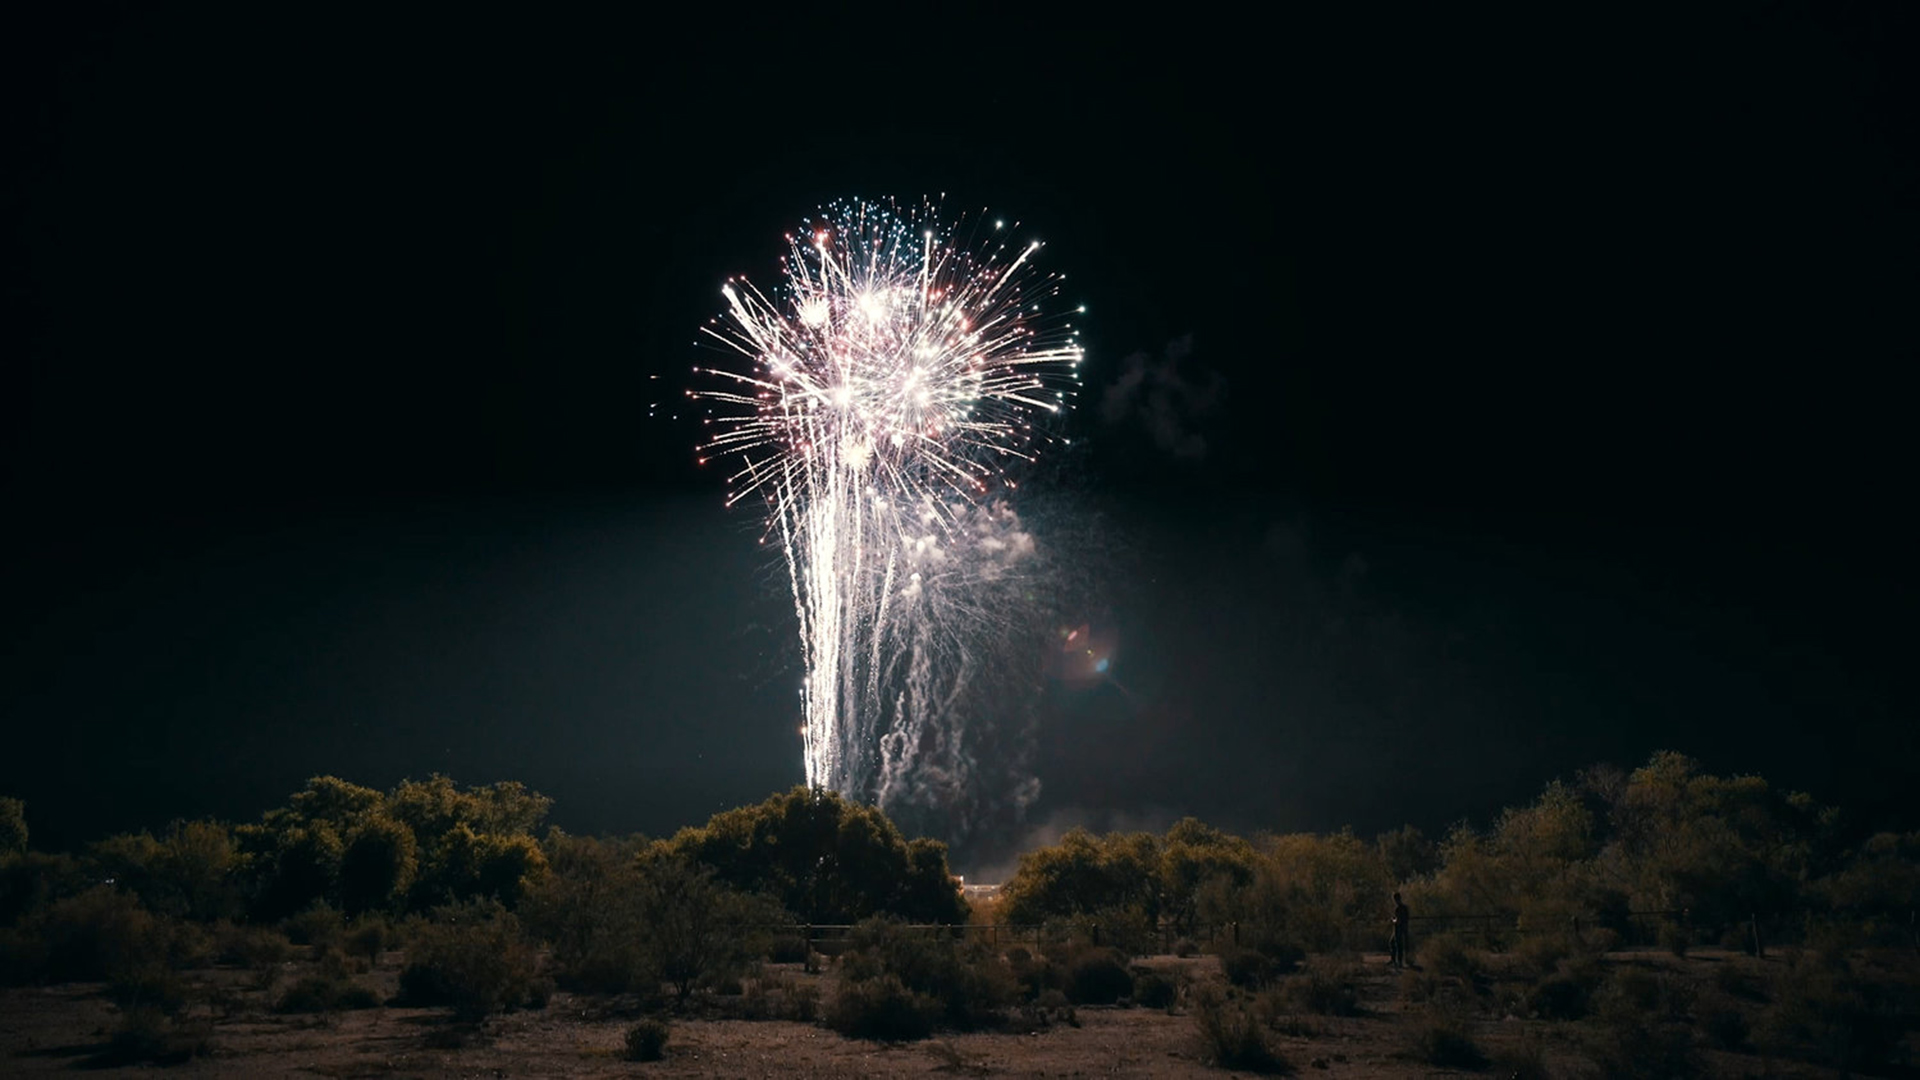 Fireworks in Marana, AZ